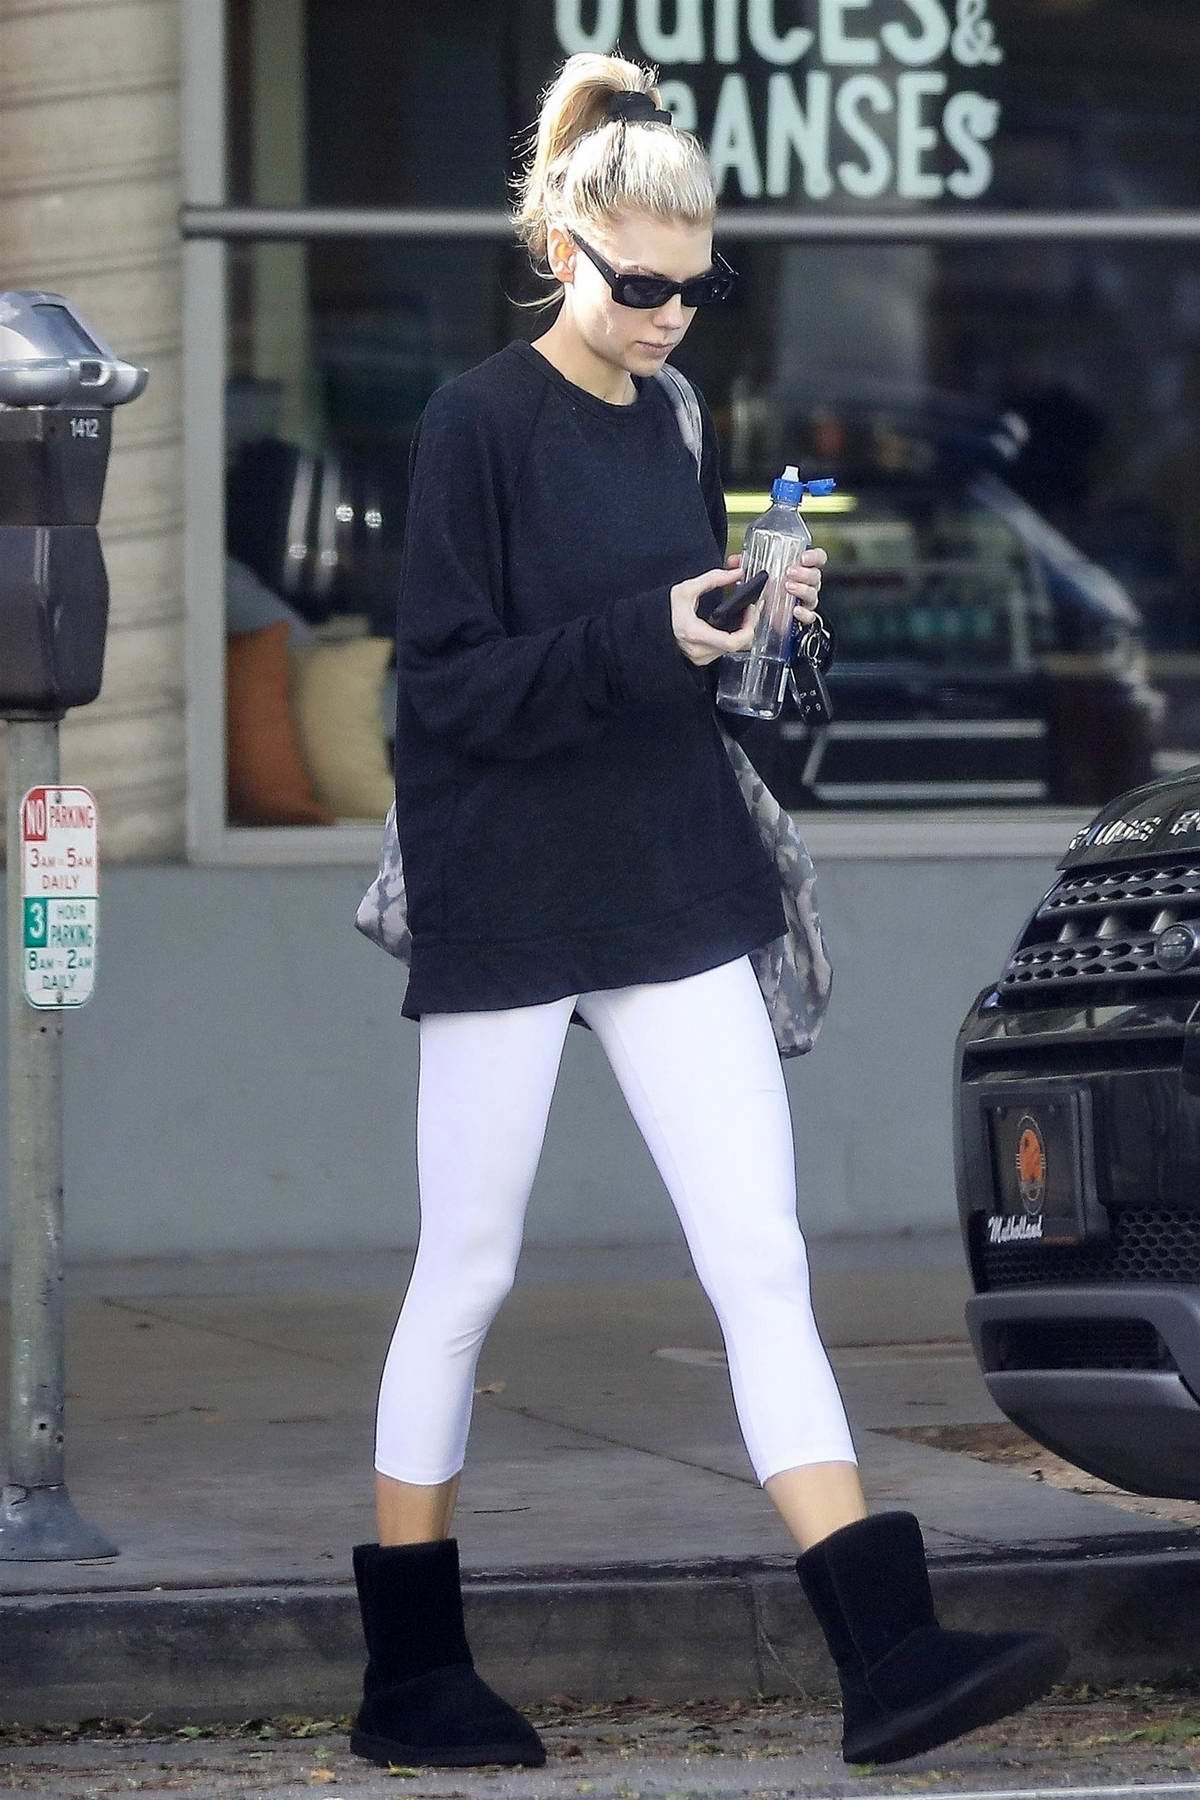 Charlotte Mckinney checks her phone as she leaves a hot yoga class in Santa Monica, California